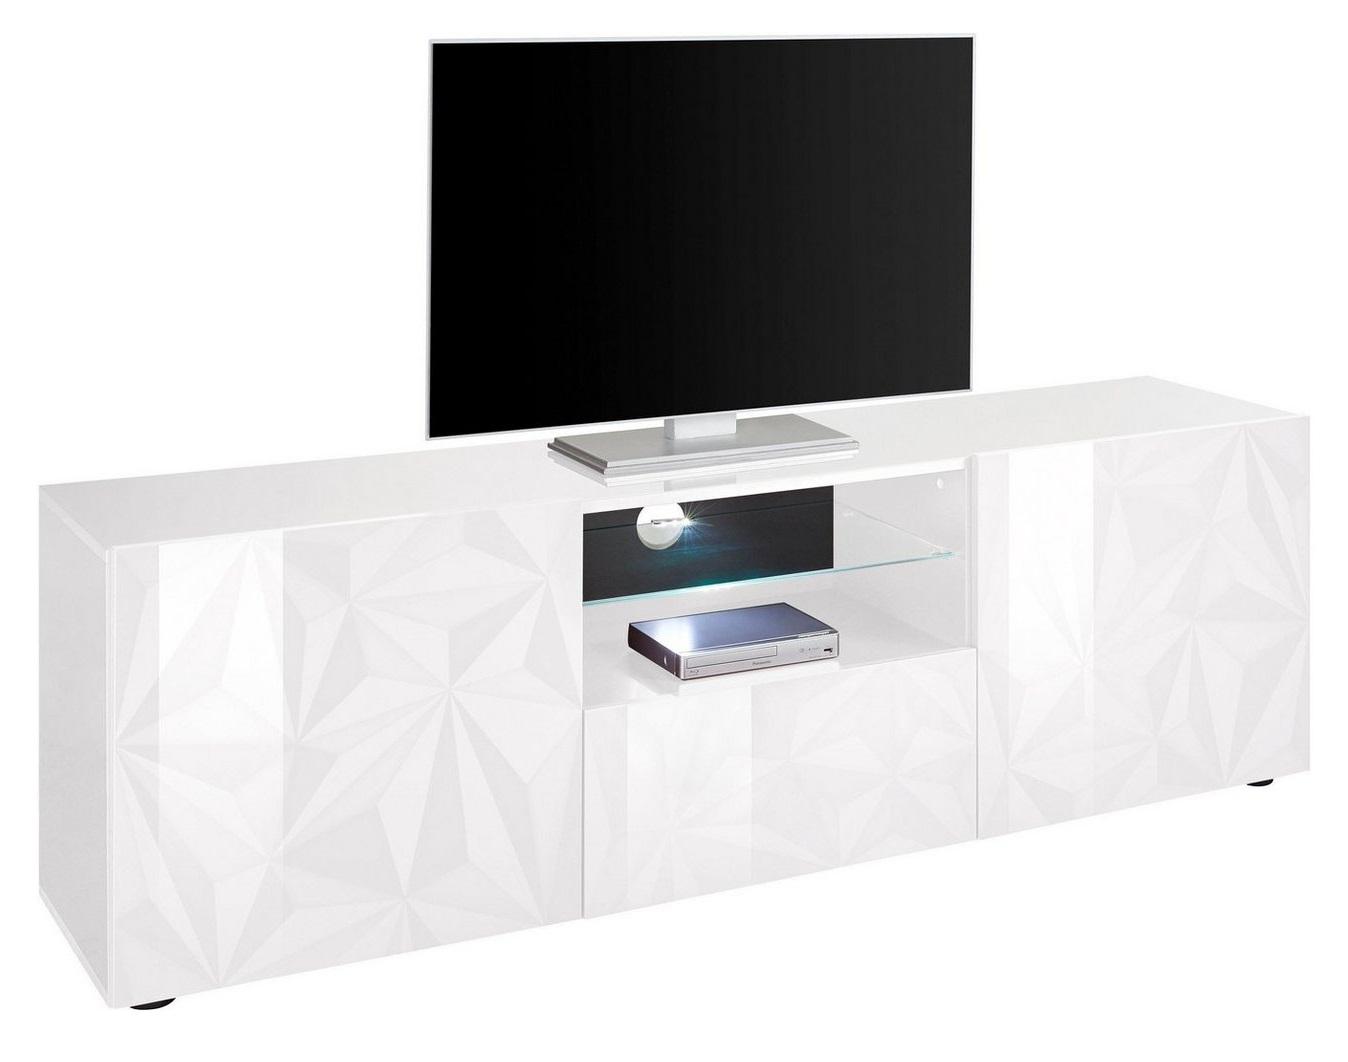 Tv-meubel Kristal 181 cm breed in hoogglans wit